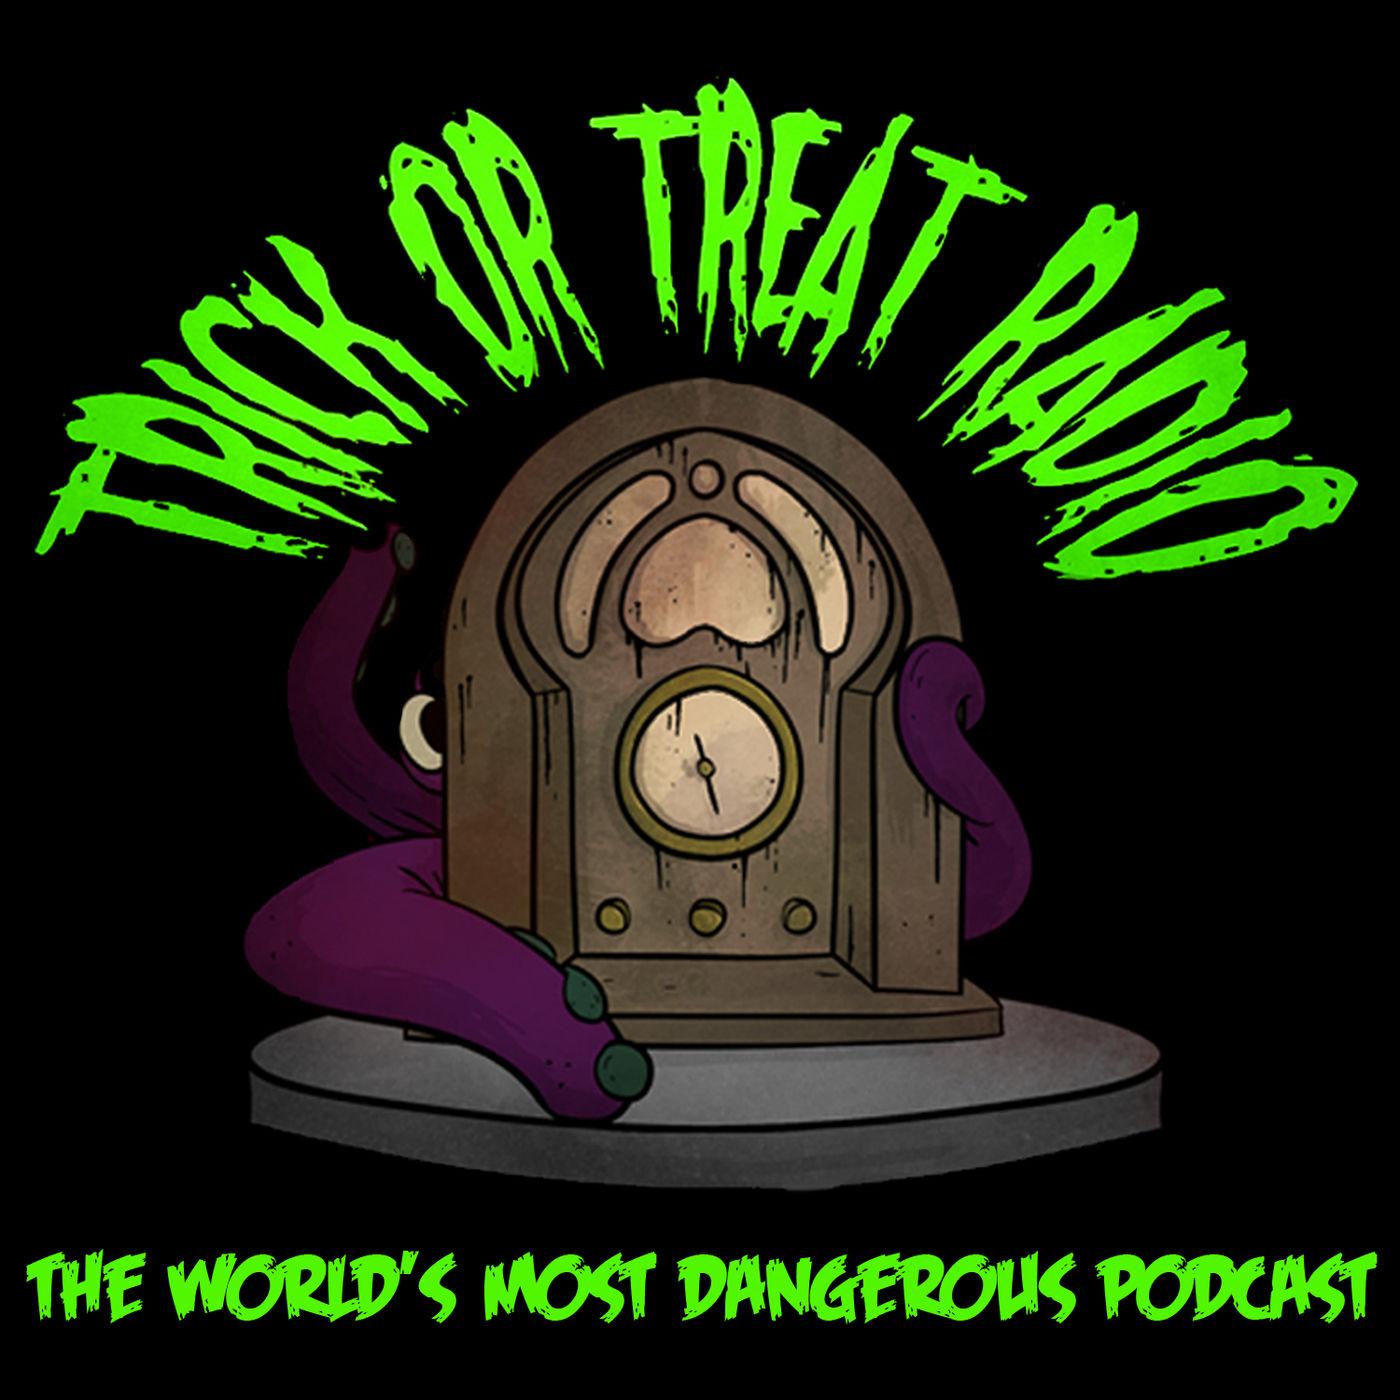 Trick or Treat Radio | Listen via Stitcher for Podcasts